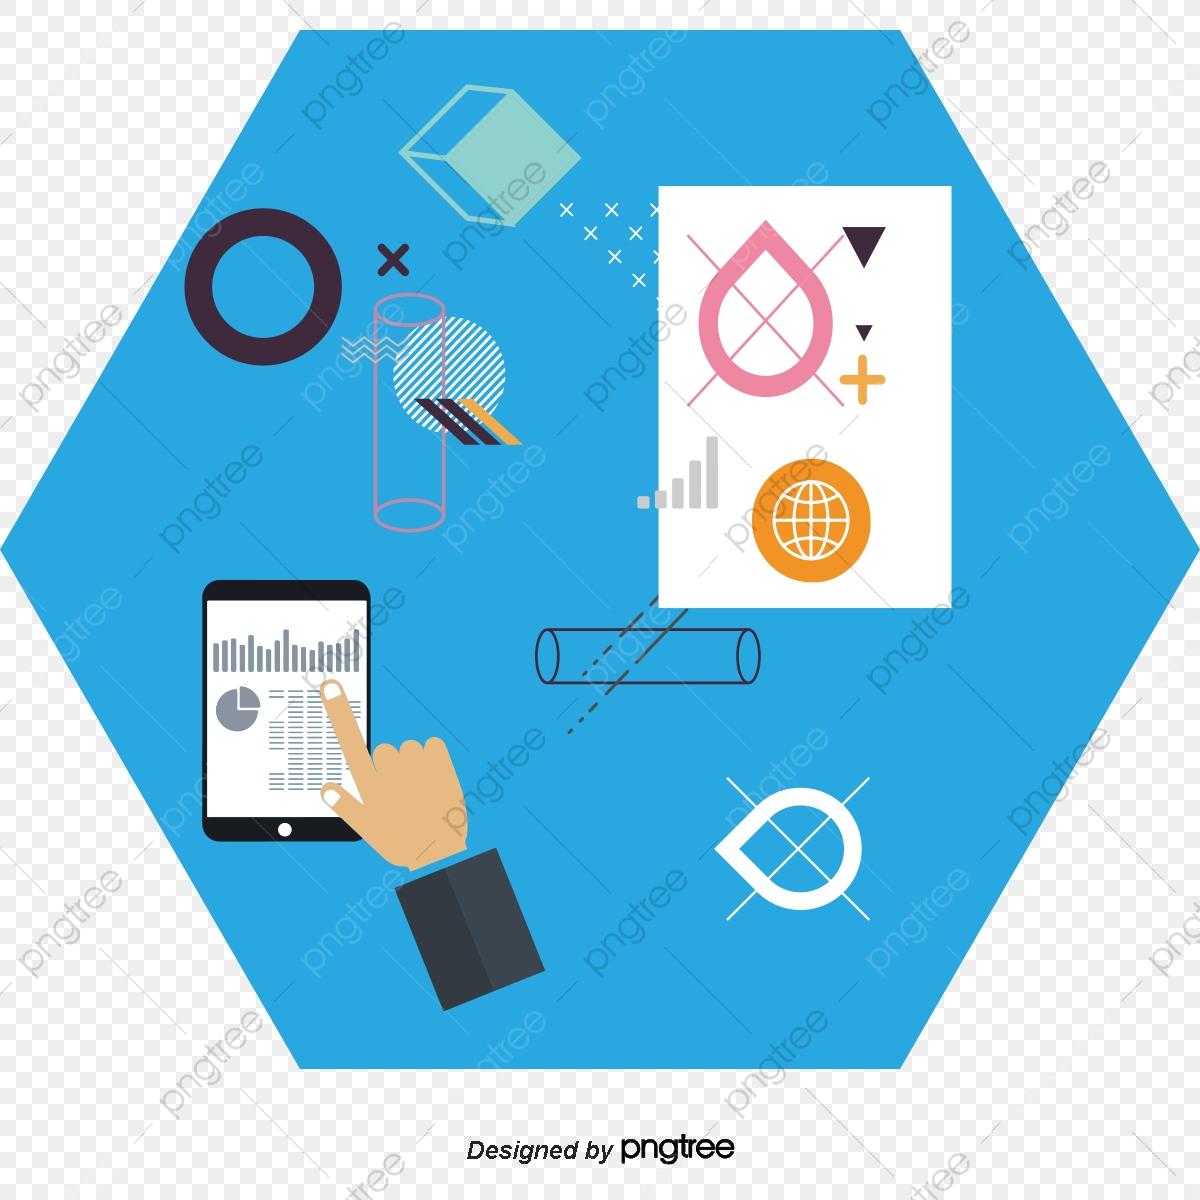 Plan de negocios download free clipart with a transparent.